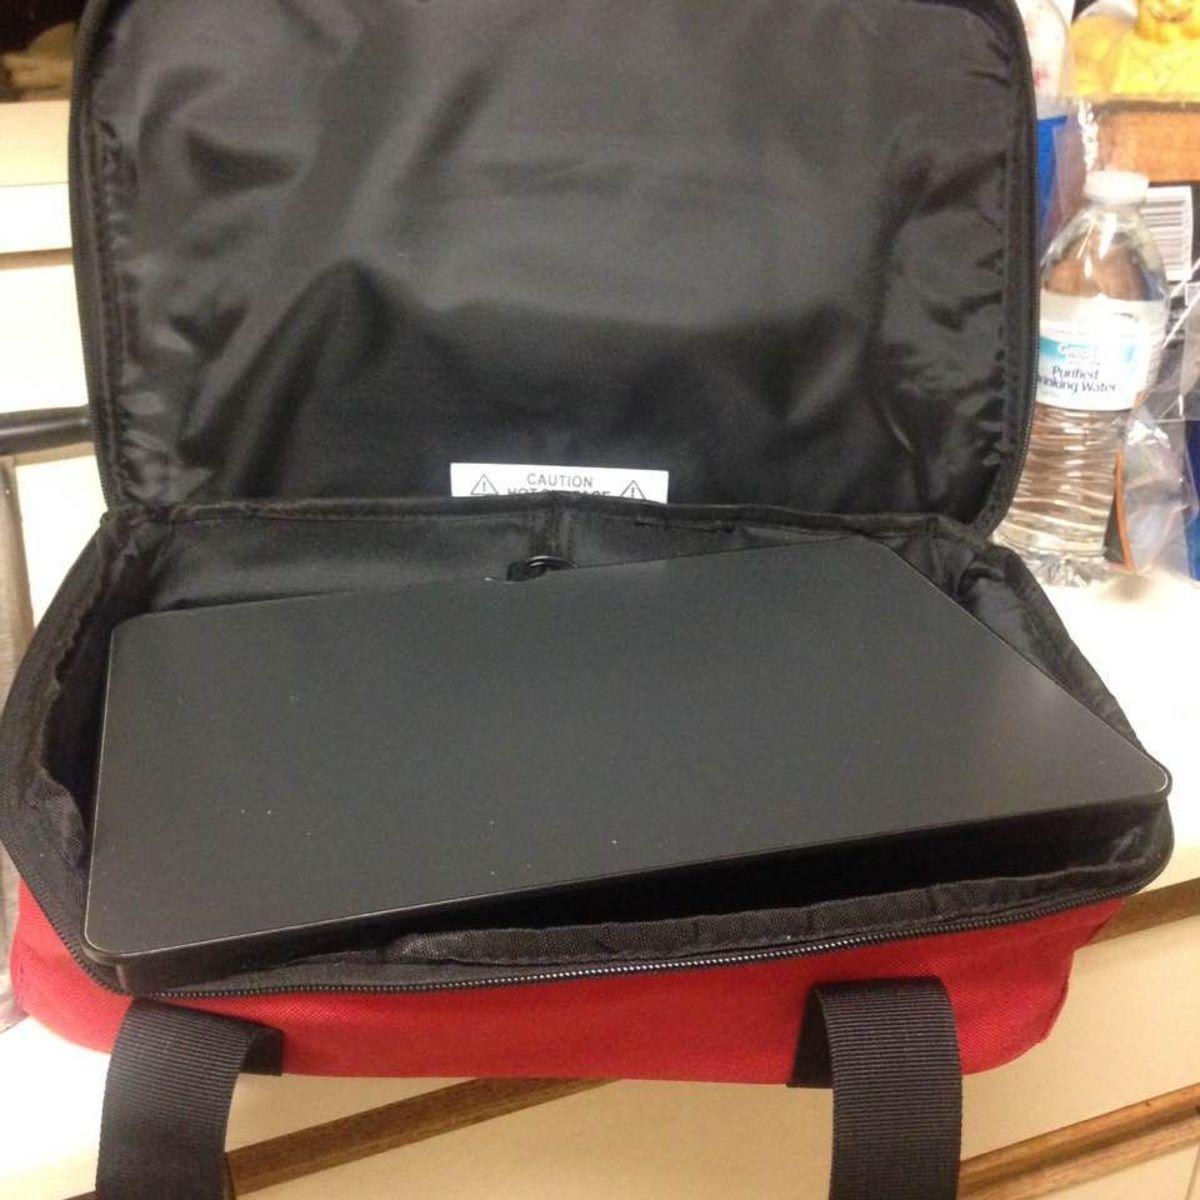 Large Hot Logic food cooker/warmer tool